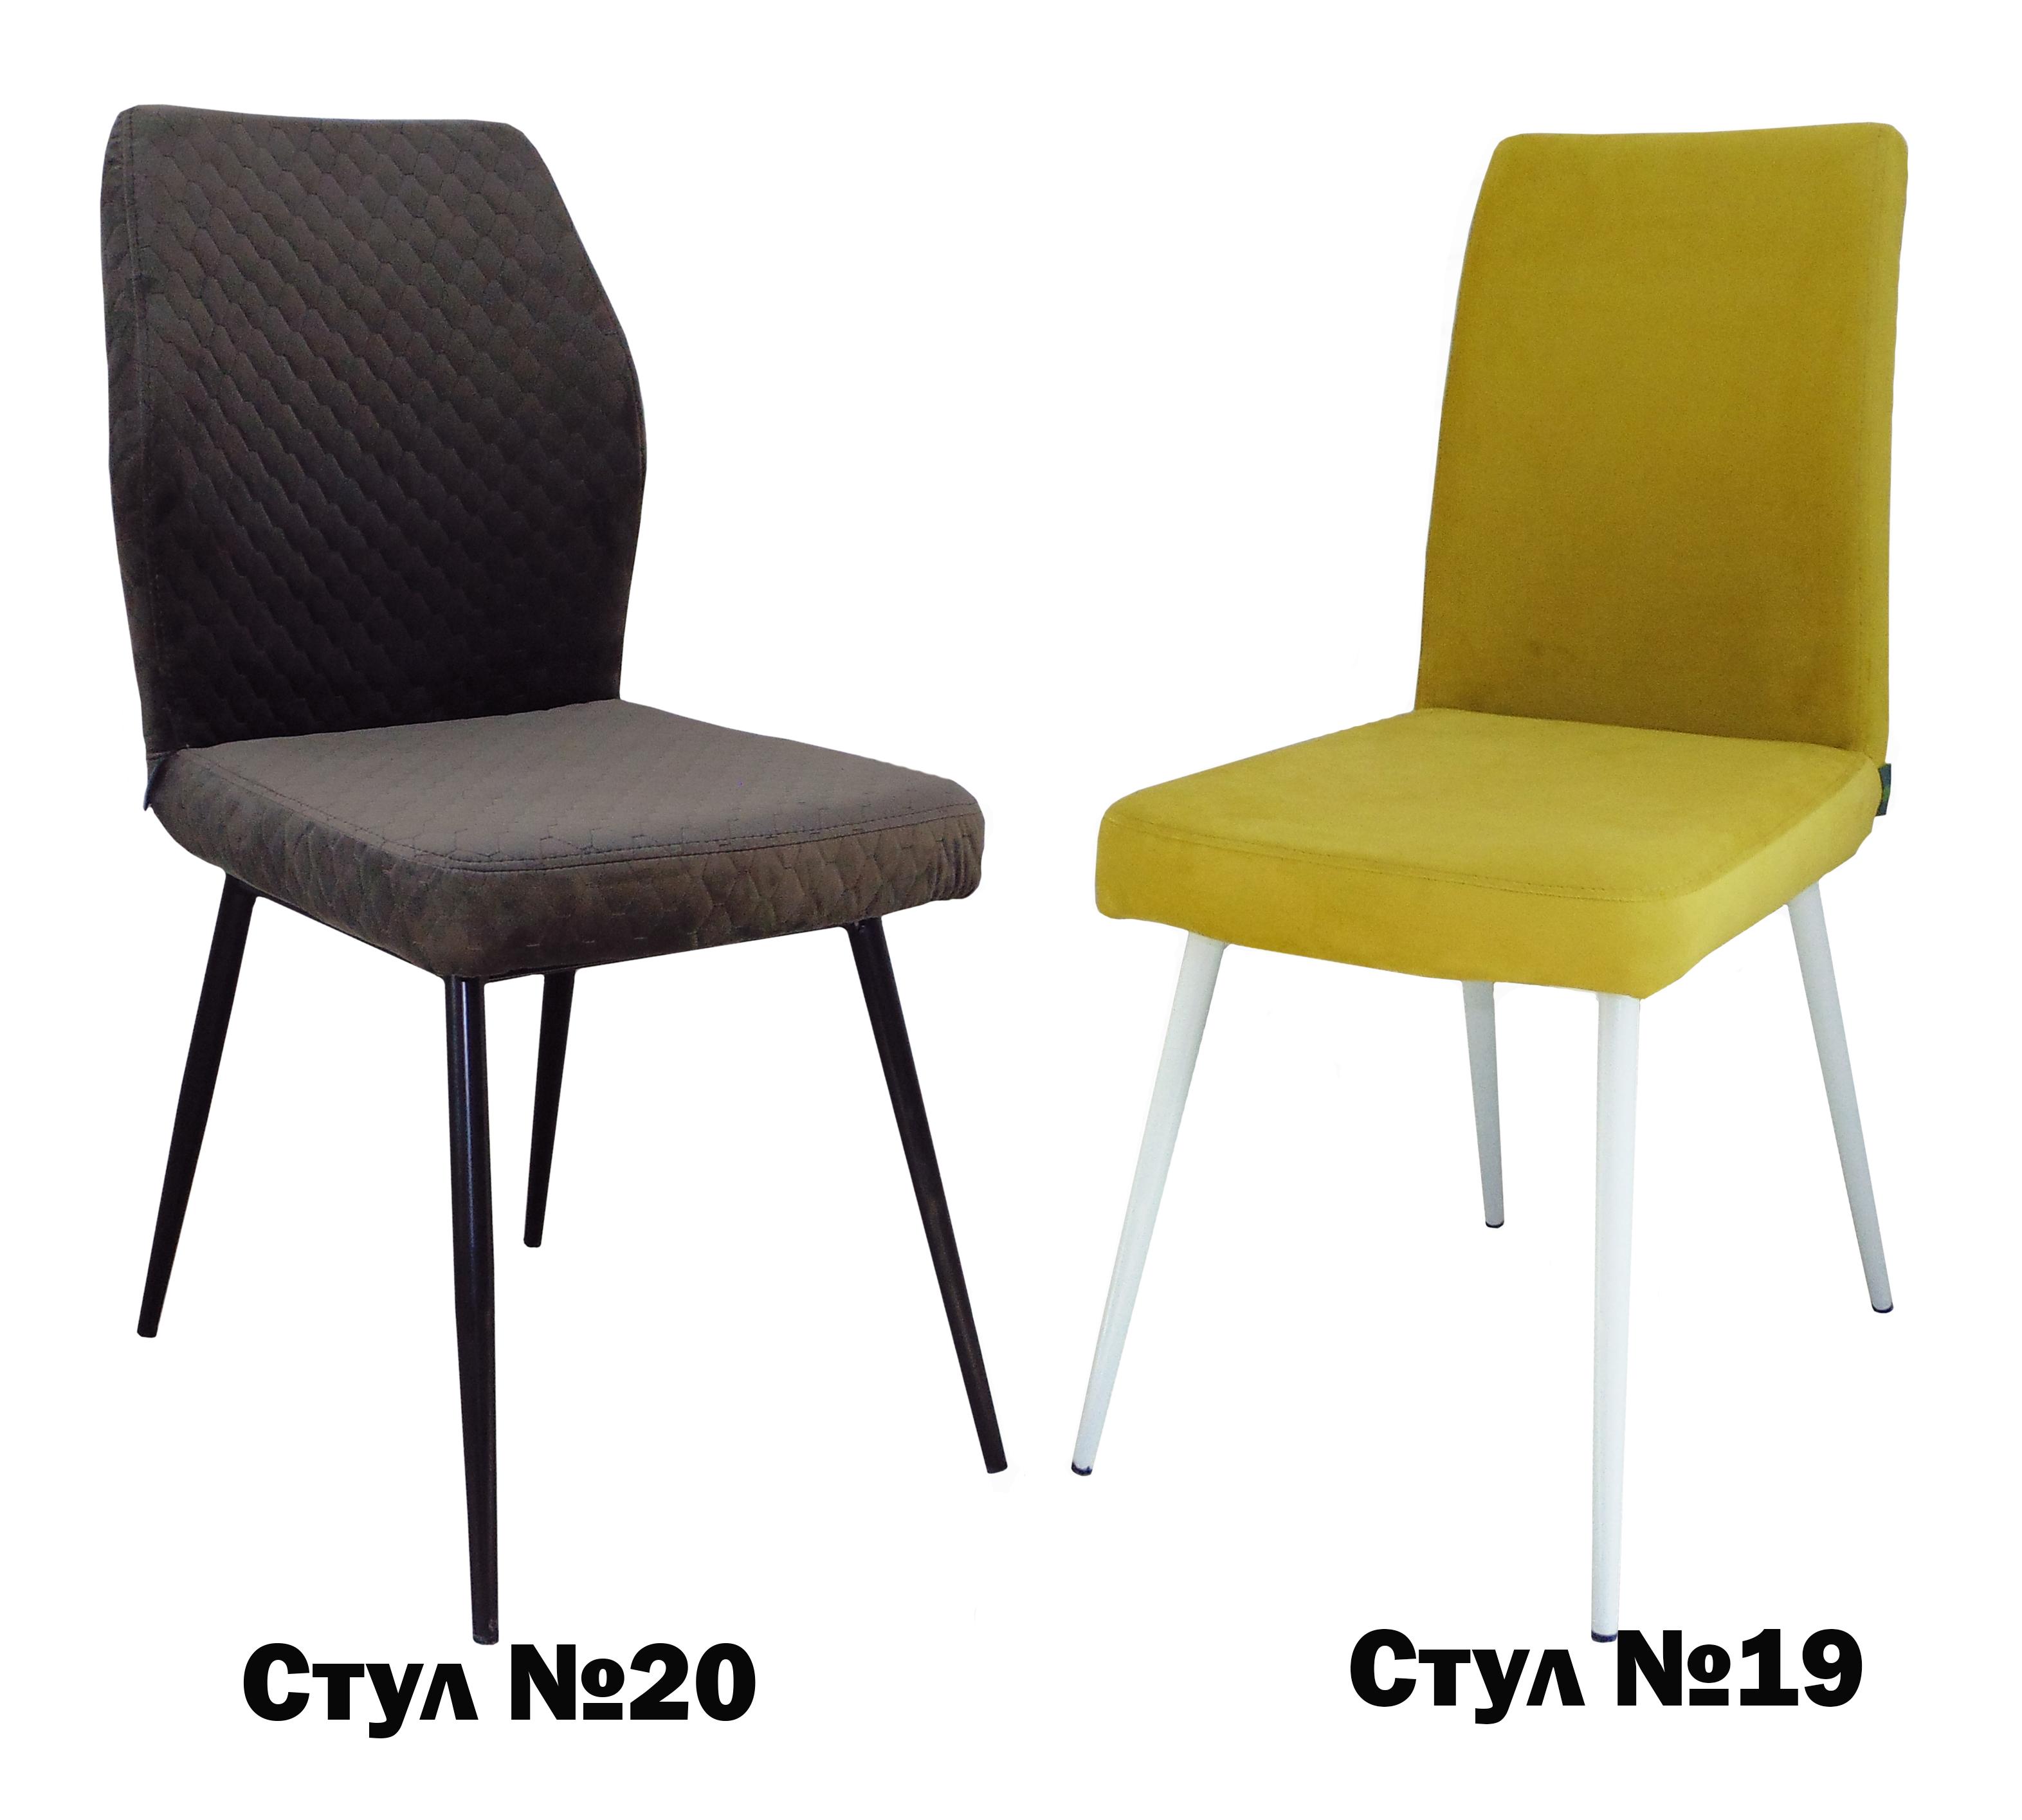 стулья металлокаркас 19 и 20 Мир стульев